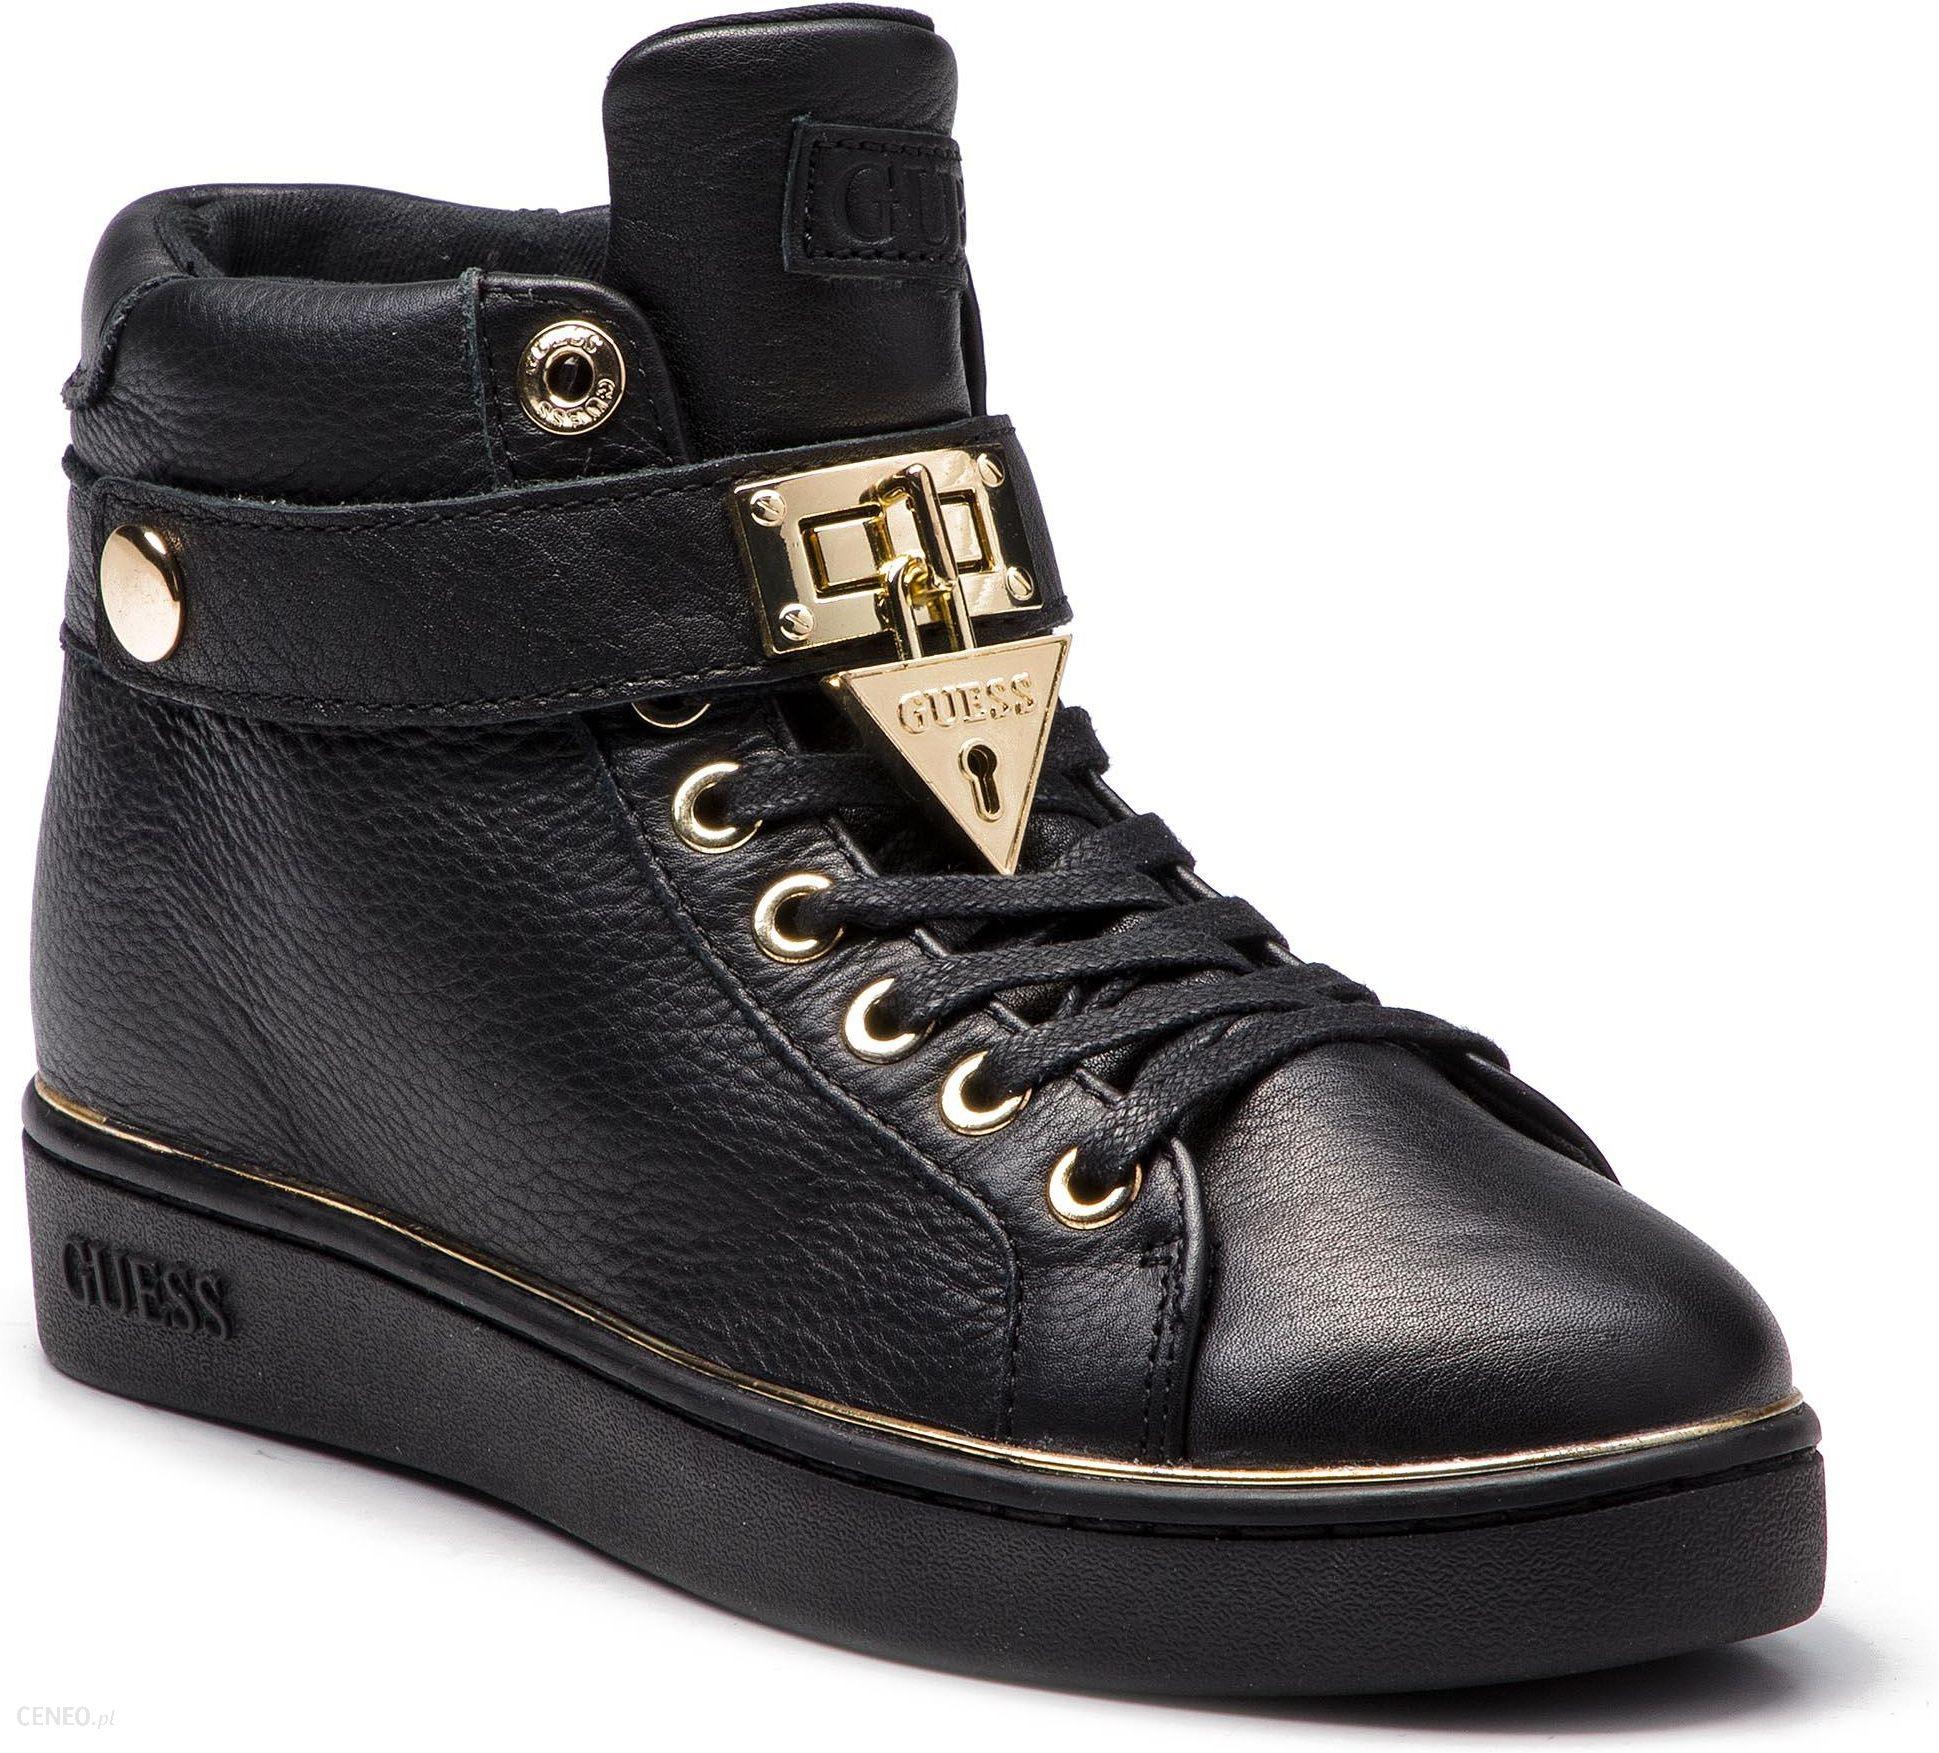 d1067cba167ea Sneakersy GUESS - FLBOG4 LEA12 BLACK - Ceny i opinie - Ceneo.pl